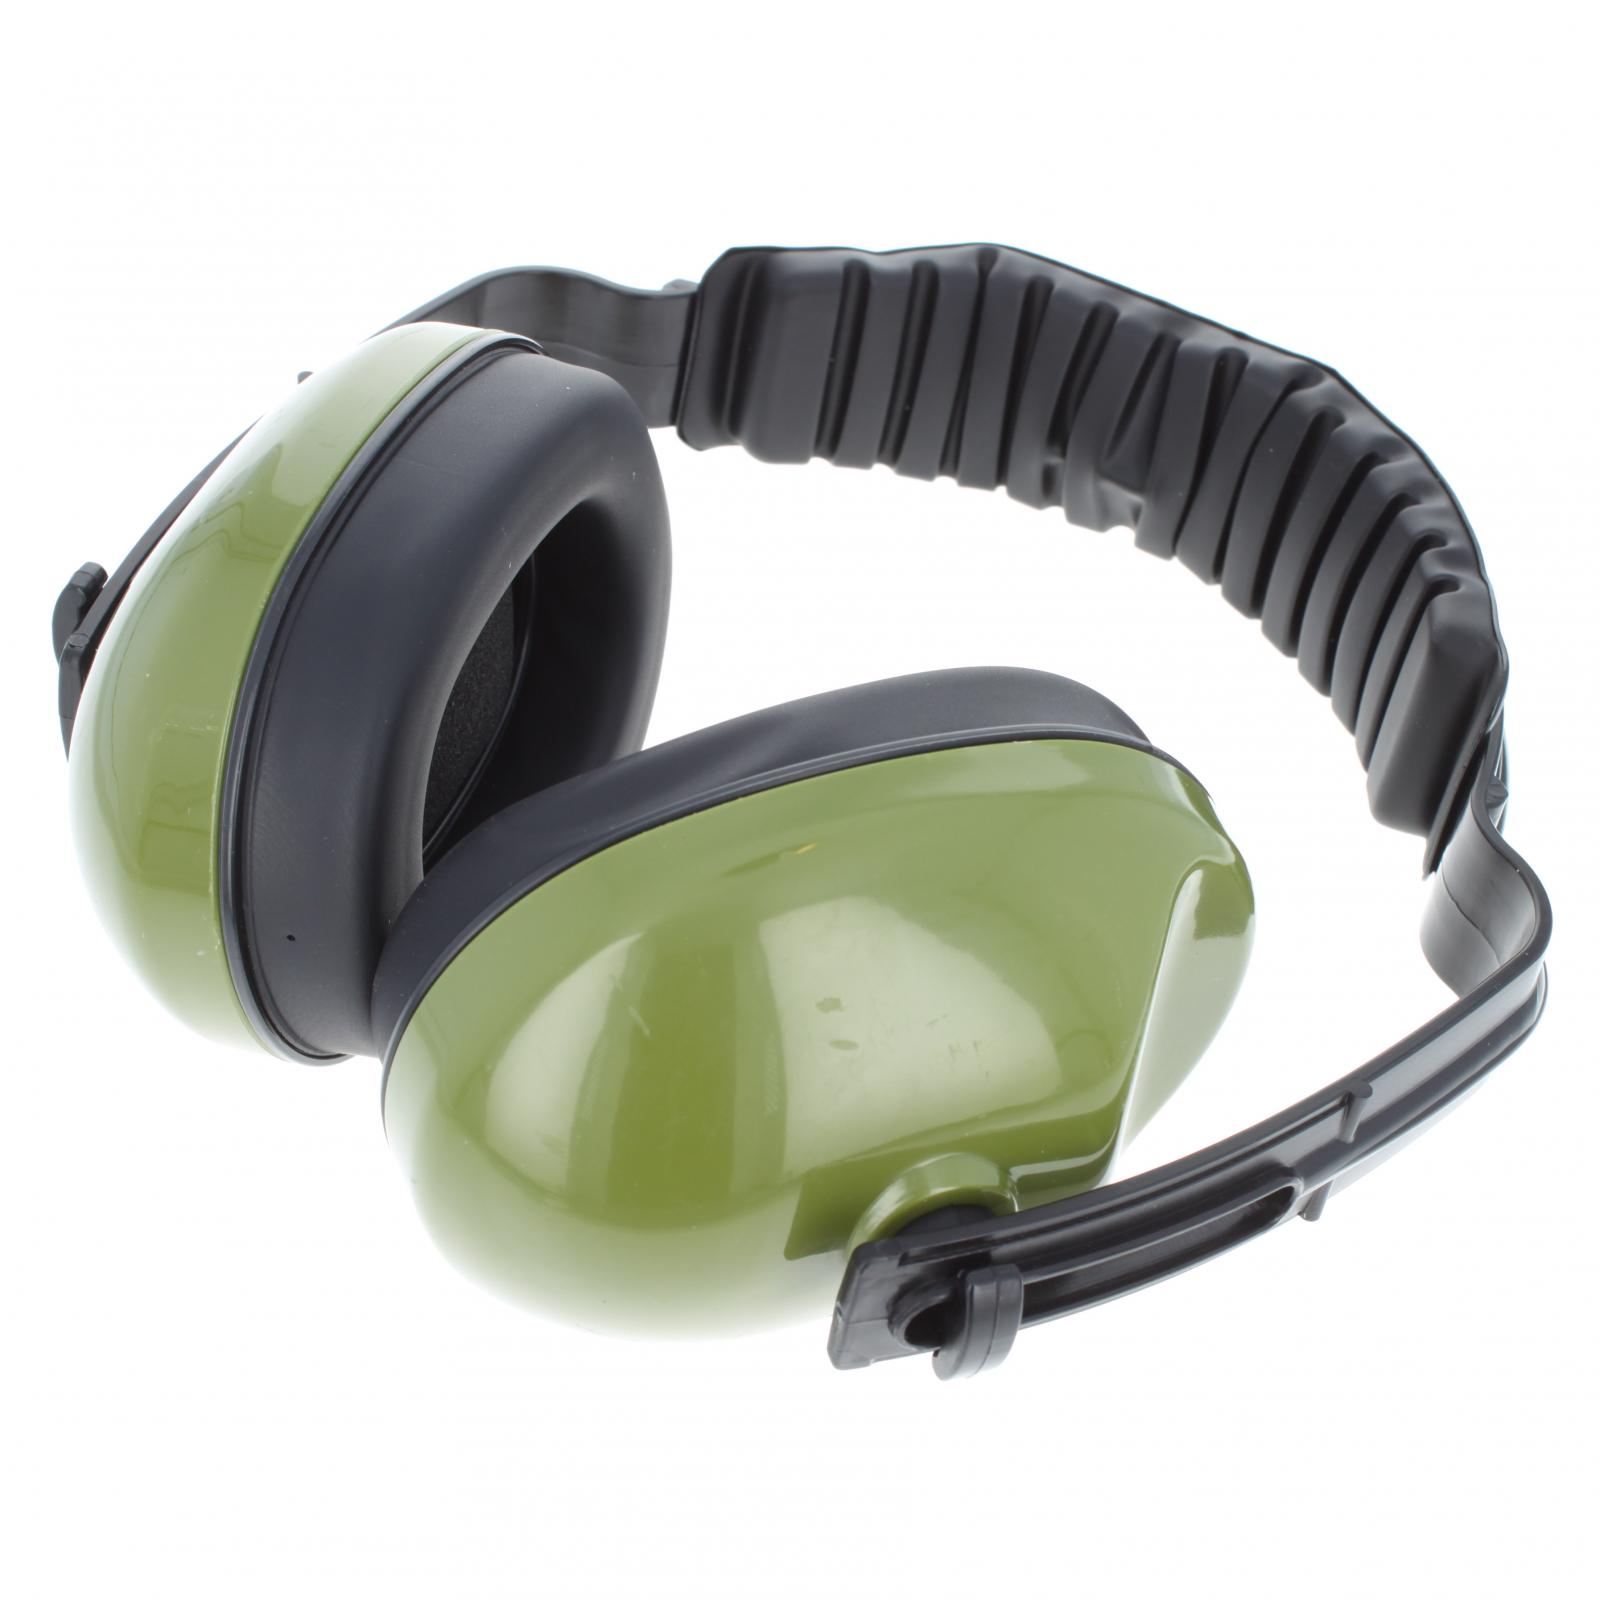 ASR Outdoor Adjustable Ear Protection Ear Muffs